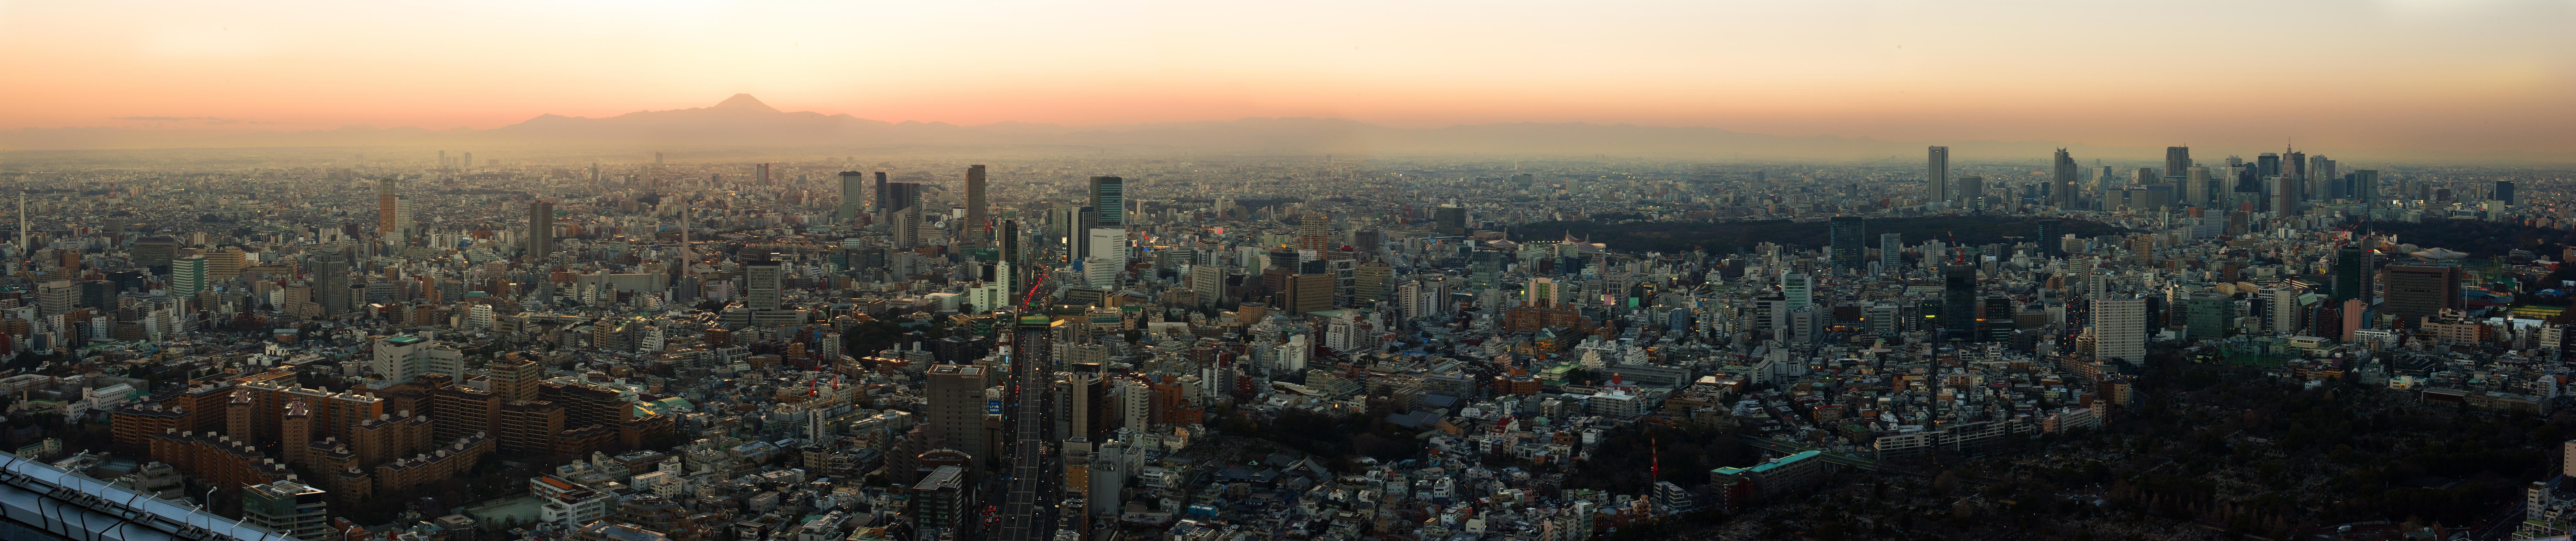 Tokyo Fuji sunset 01 sml